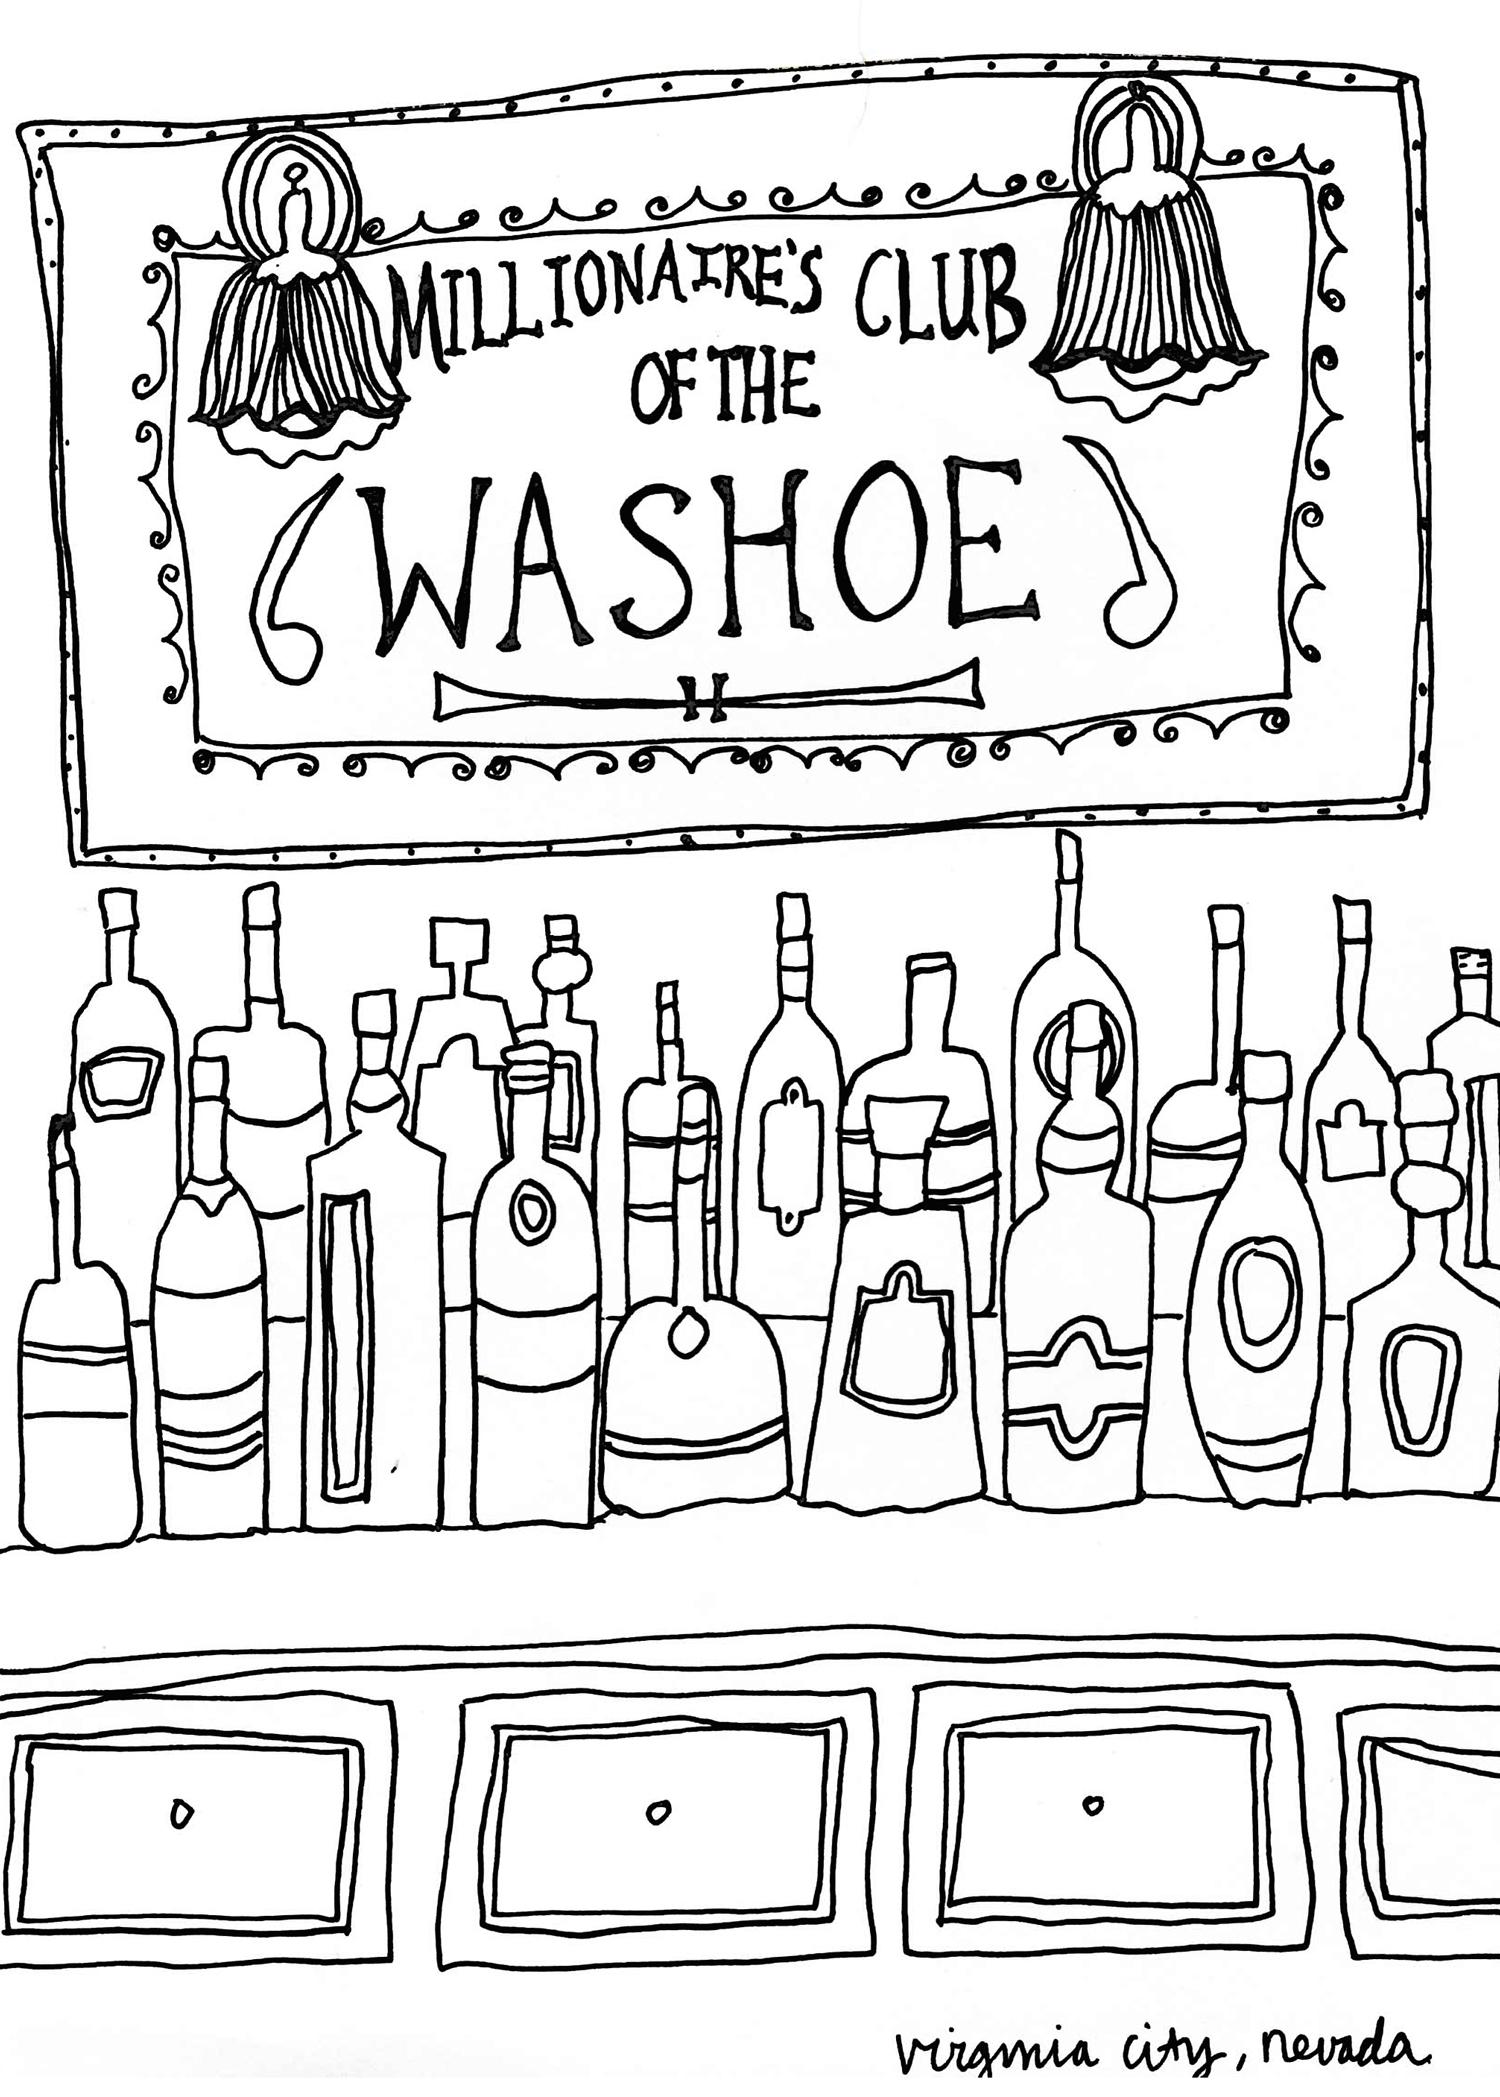 millionaires club washoe virginia city nevada drawing illustration nicole stevenson studio design drawing.jpg